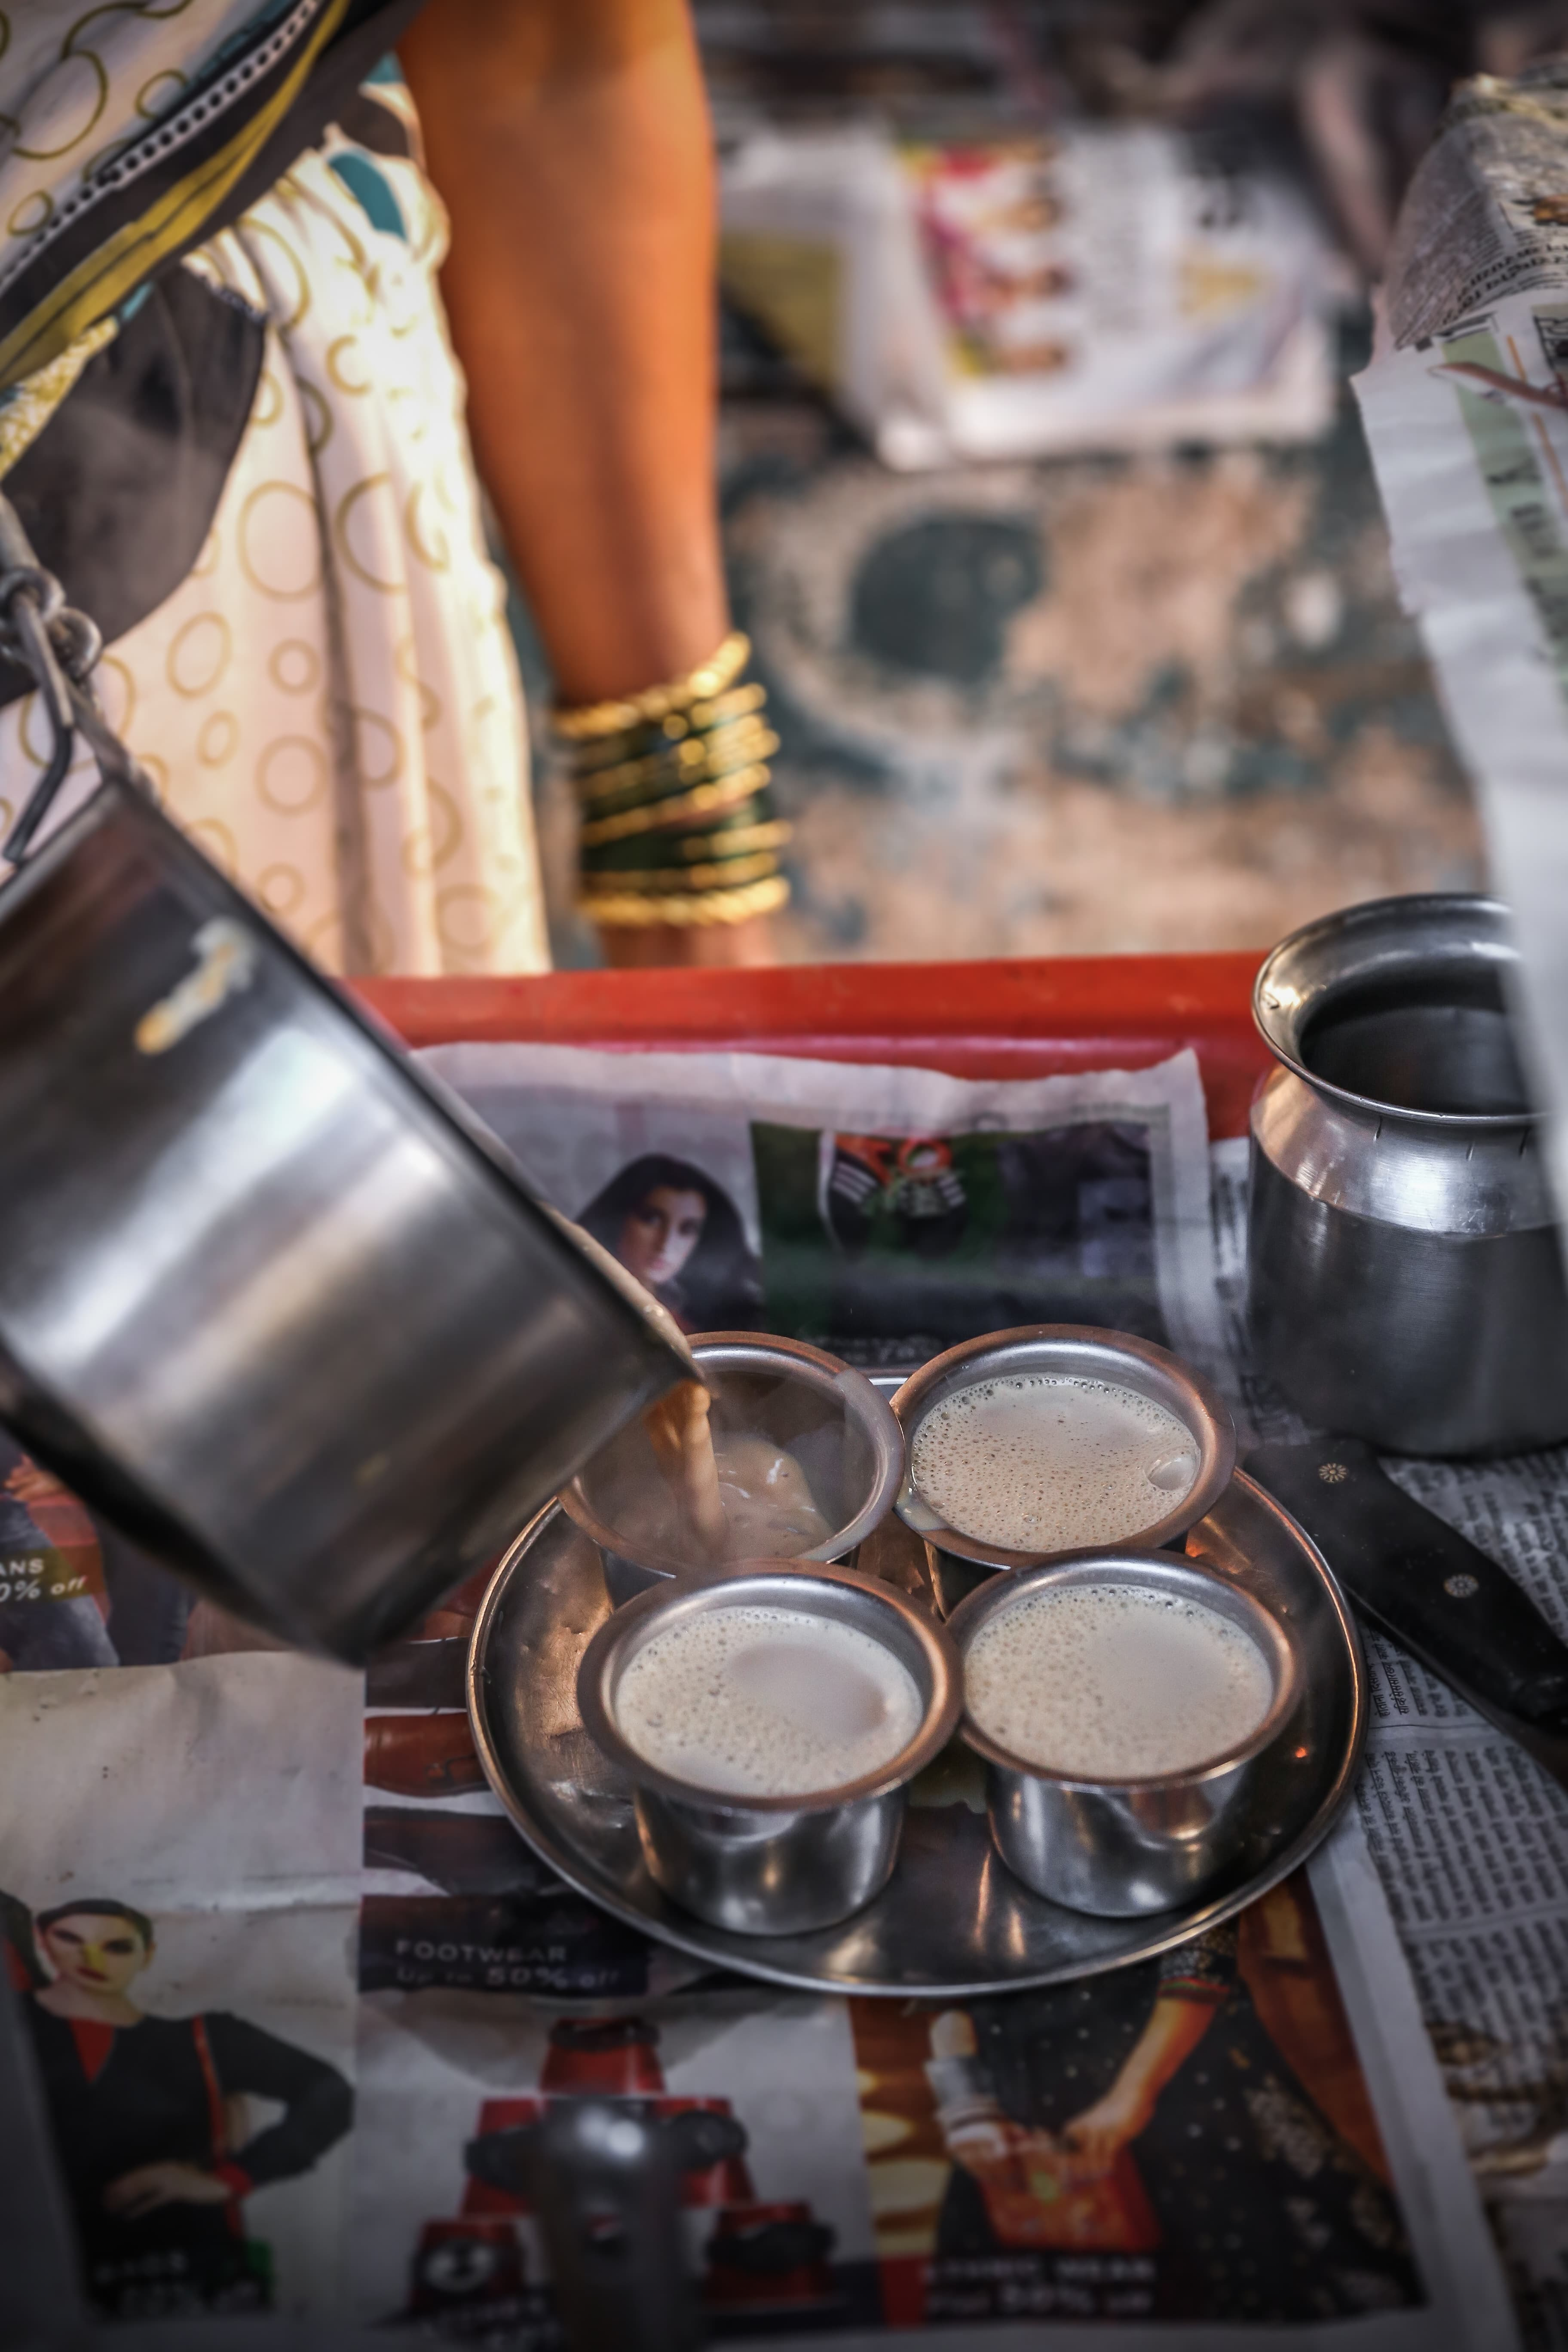 vadapav, coffee,mumbai, streetfood, foodphotographer, foodbloggers, batatavada recipe, indianfood, indianfoodbloggers, streetfoodofindia,